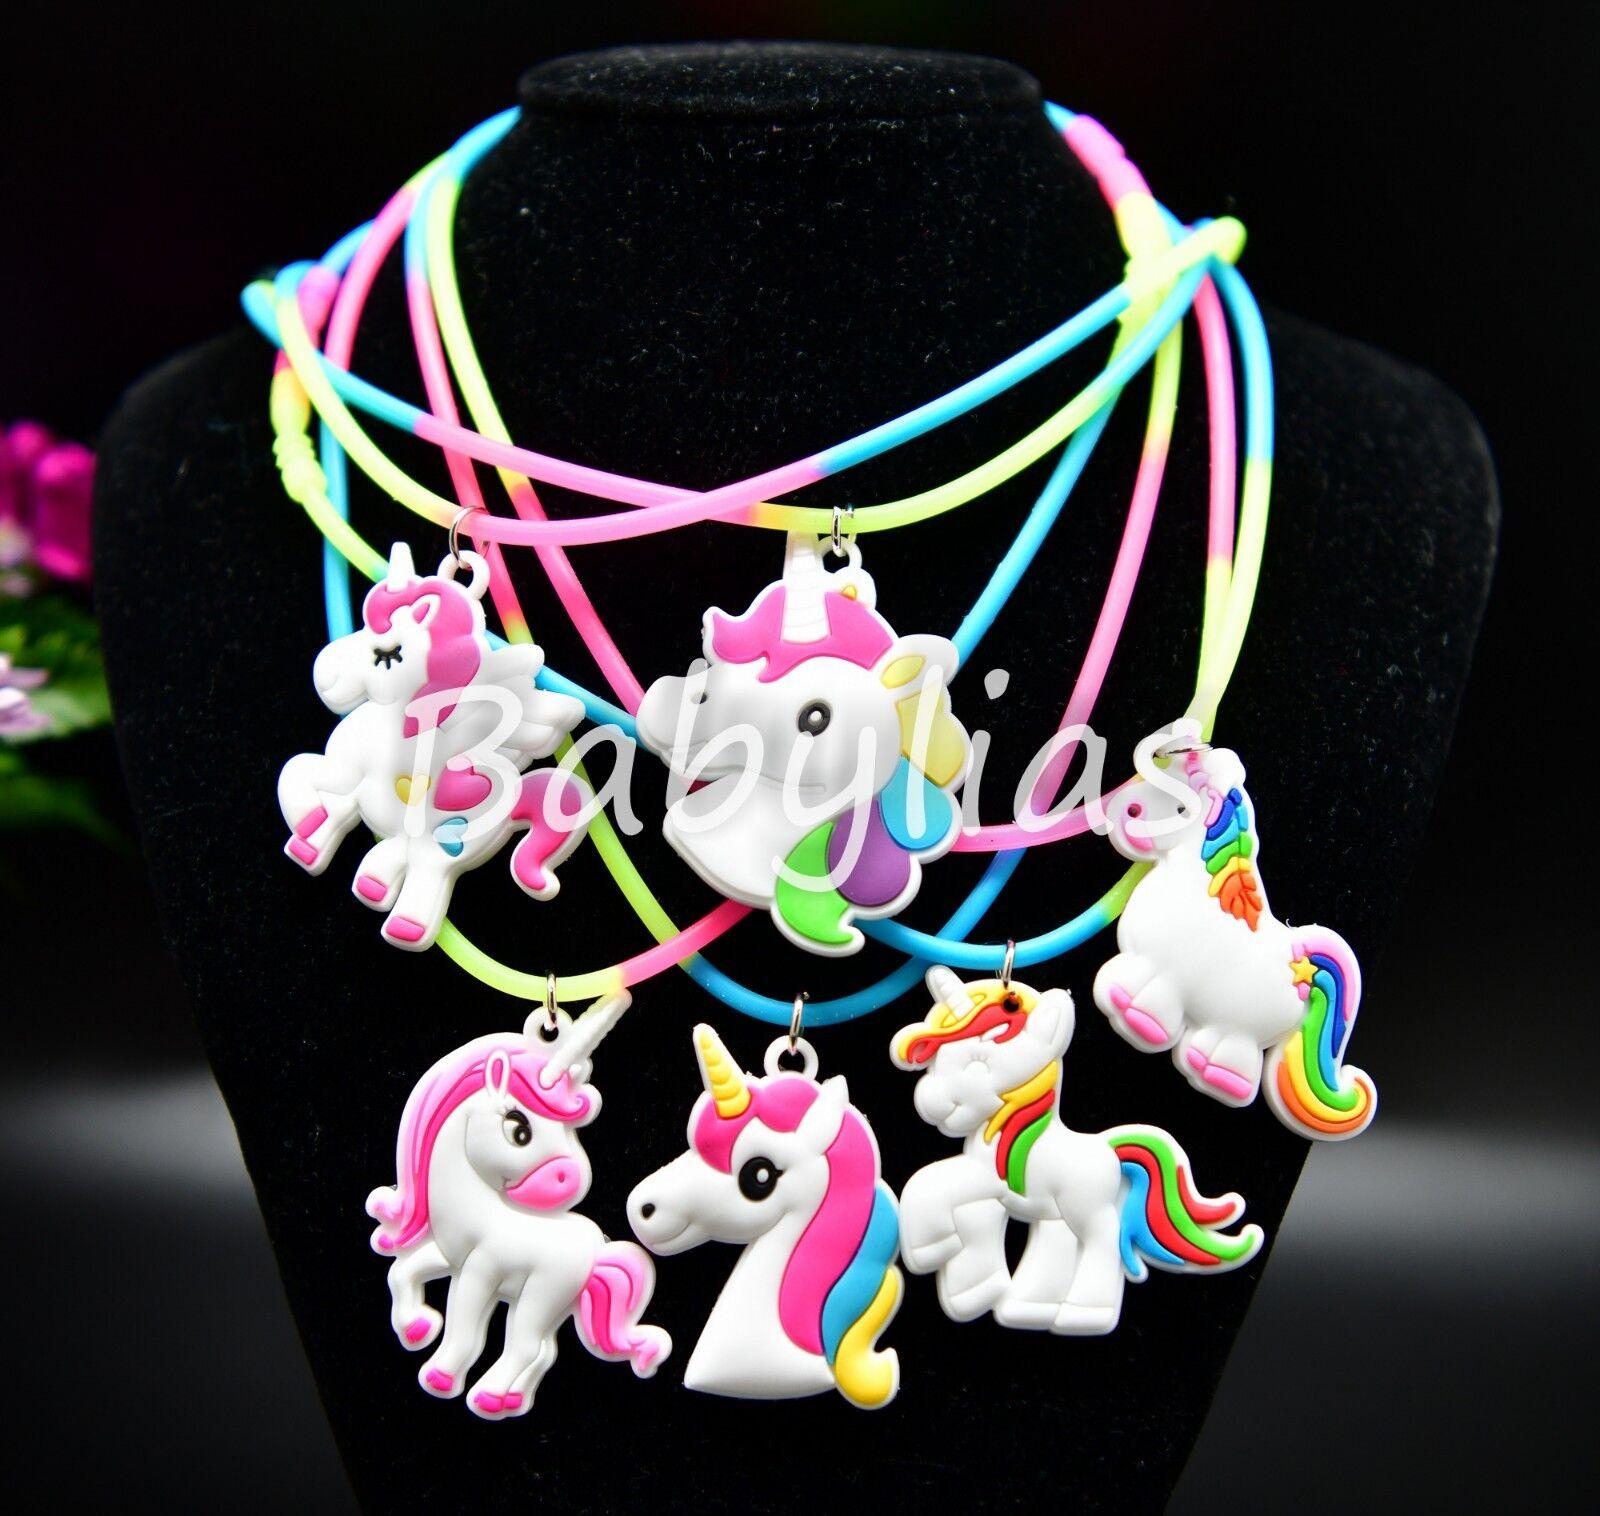 как выглядит Сувенир для праздника или вечеринки 12 Unicorn Favors Necklaces Birthday Party Bag Fillers Rainbow Unicornio Kids фото